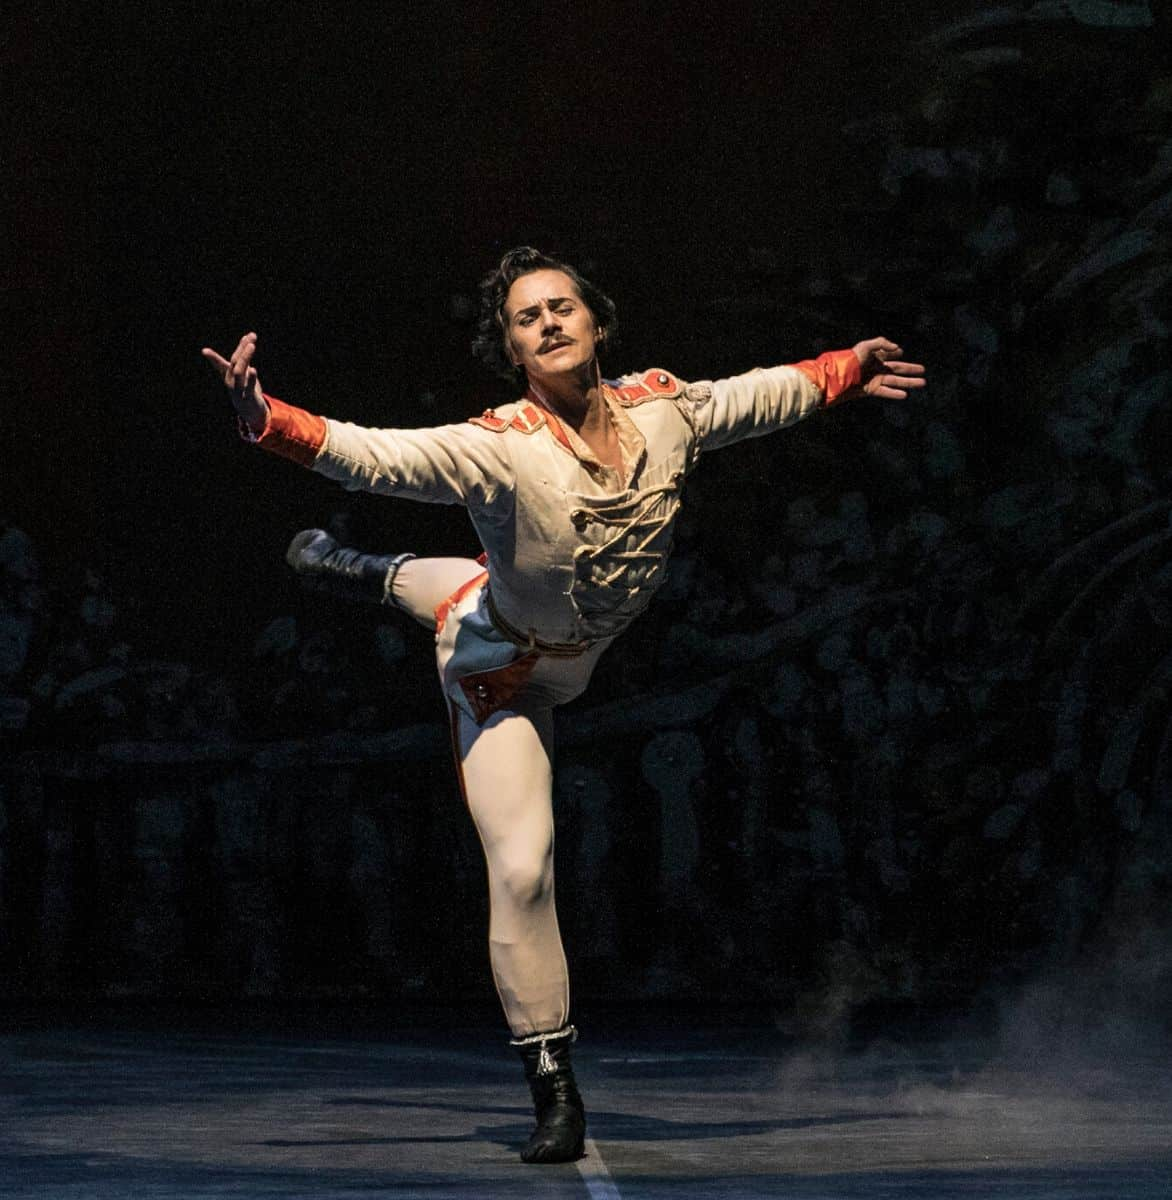 Danceworks guest teacher Alejandro Parente